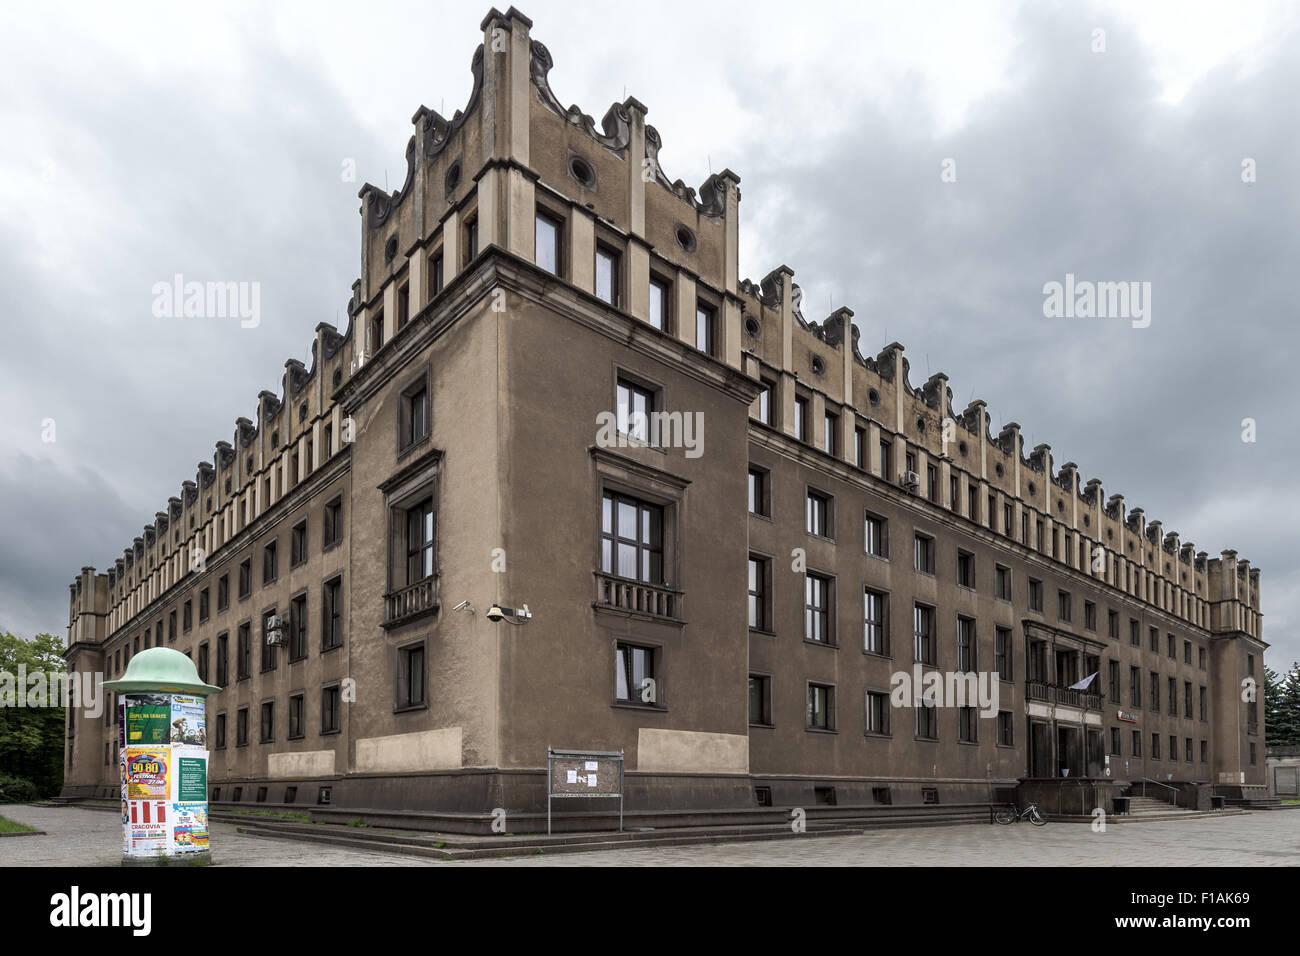 Mittal (was Stalin) Steel Works Nowa Huta (New Steel Works) Stalinist Krakow Poland - Stock Image